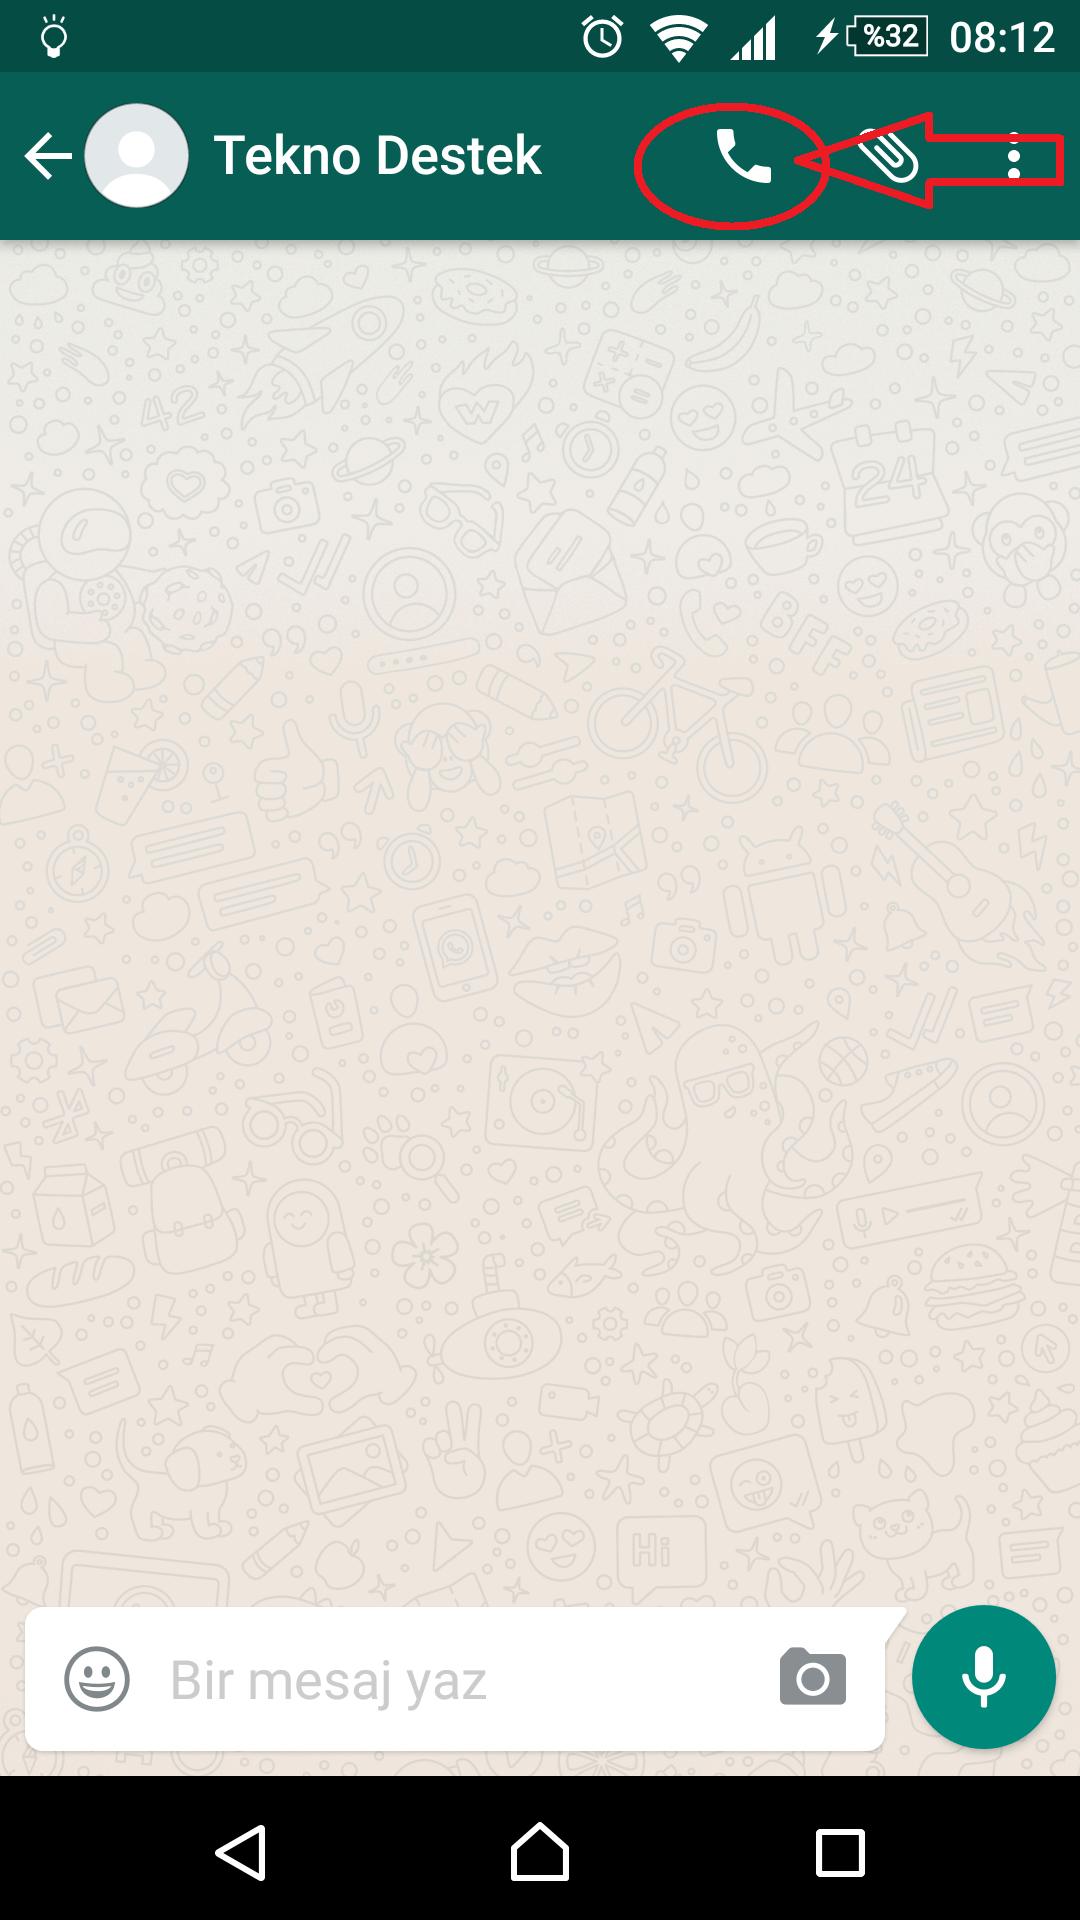 screenshot_20161118-0812312